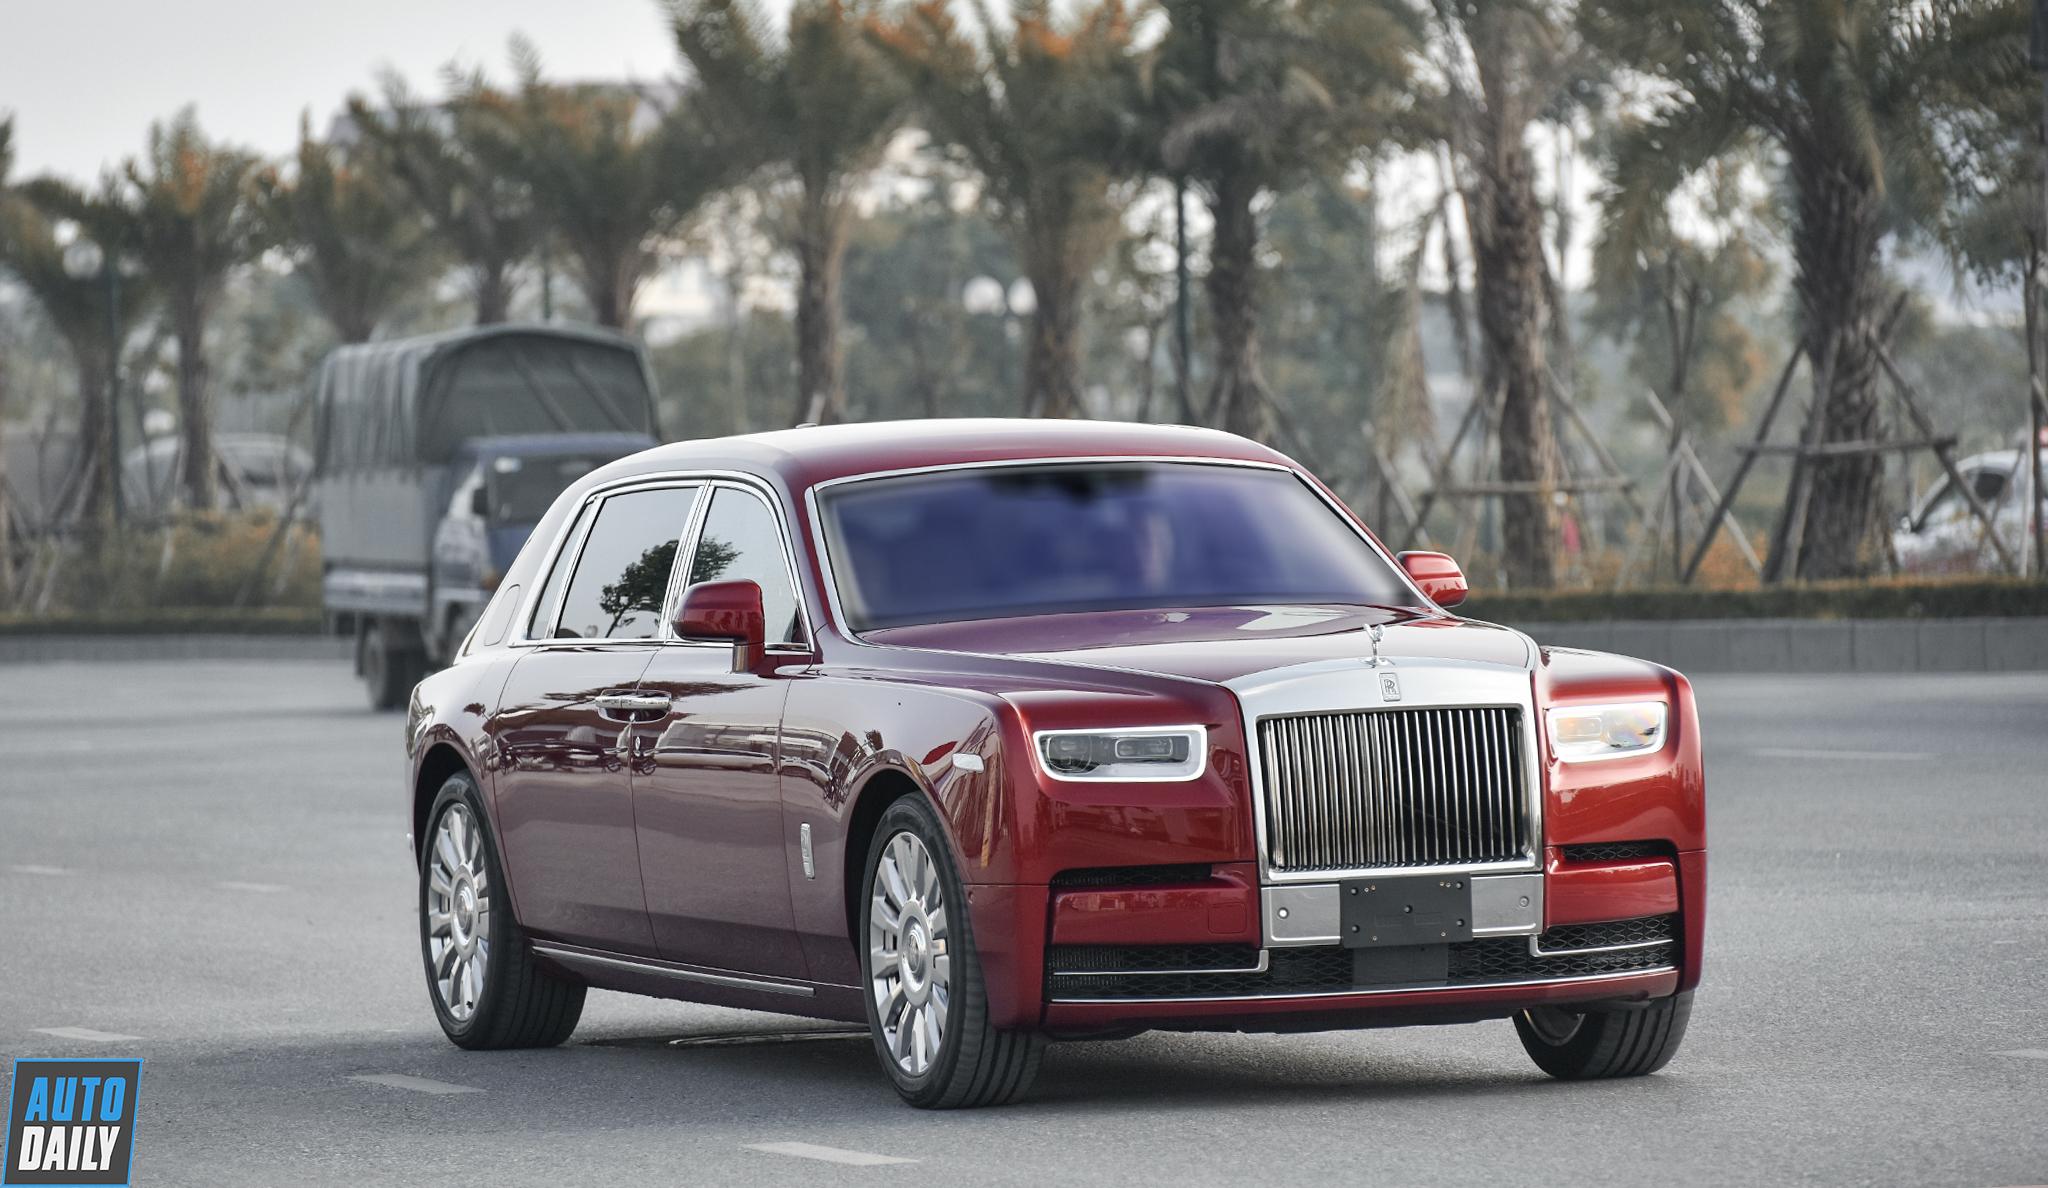 rolls-royce-phantom-2018-autodaily-5.jpg